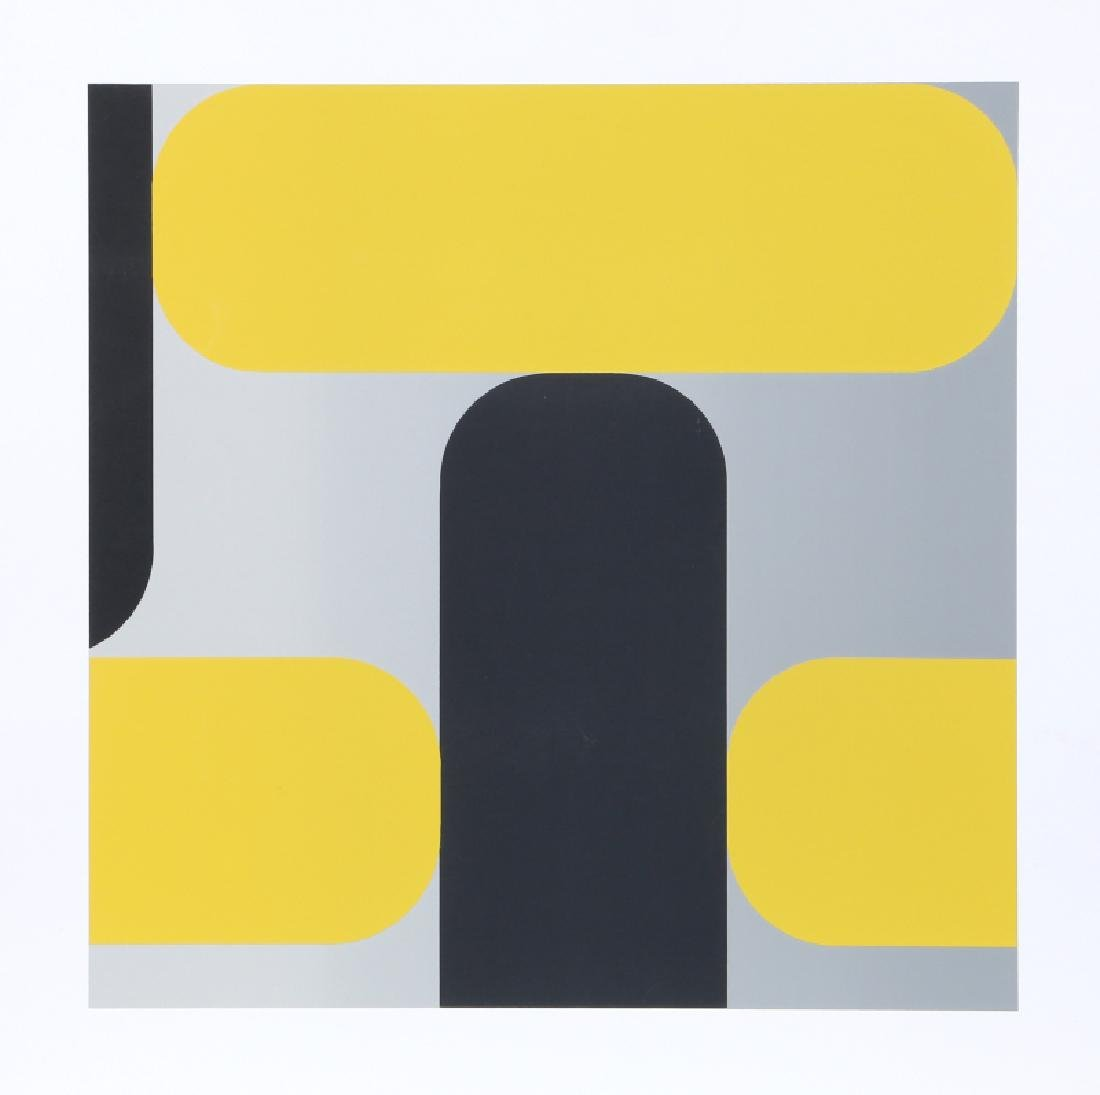 Kaspar Thomas Lenk, Untitled III, Screenprint